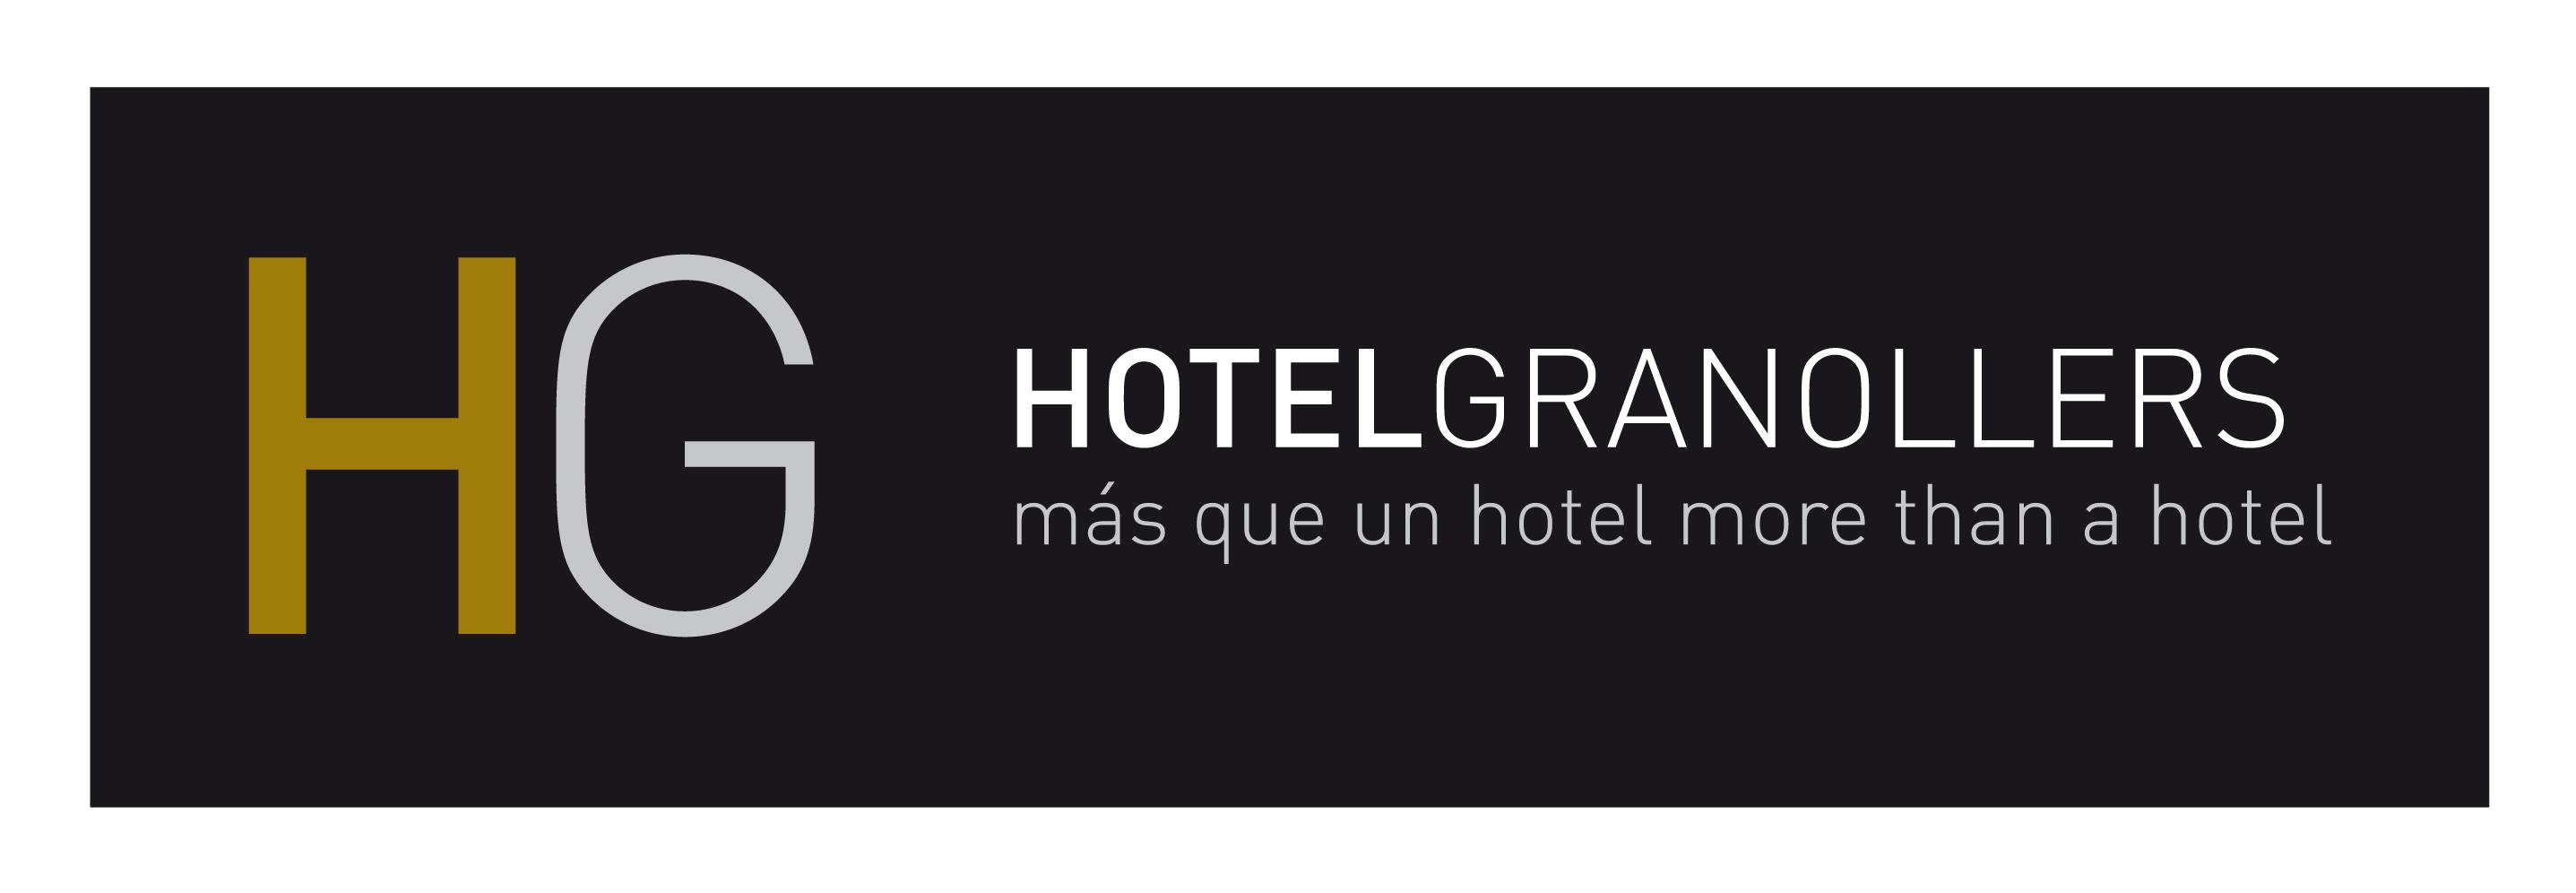 HG_HOTELGRANOLLERS